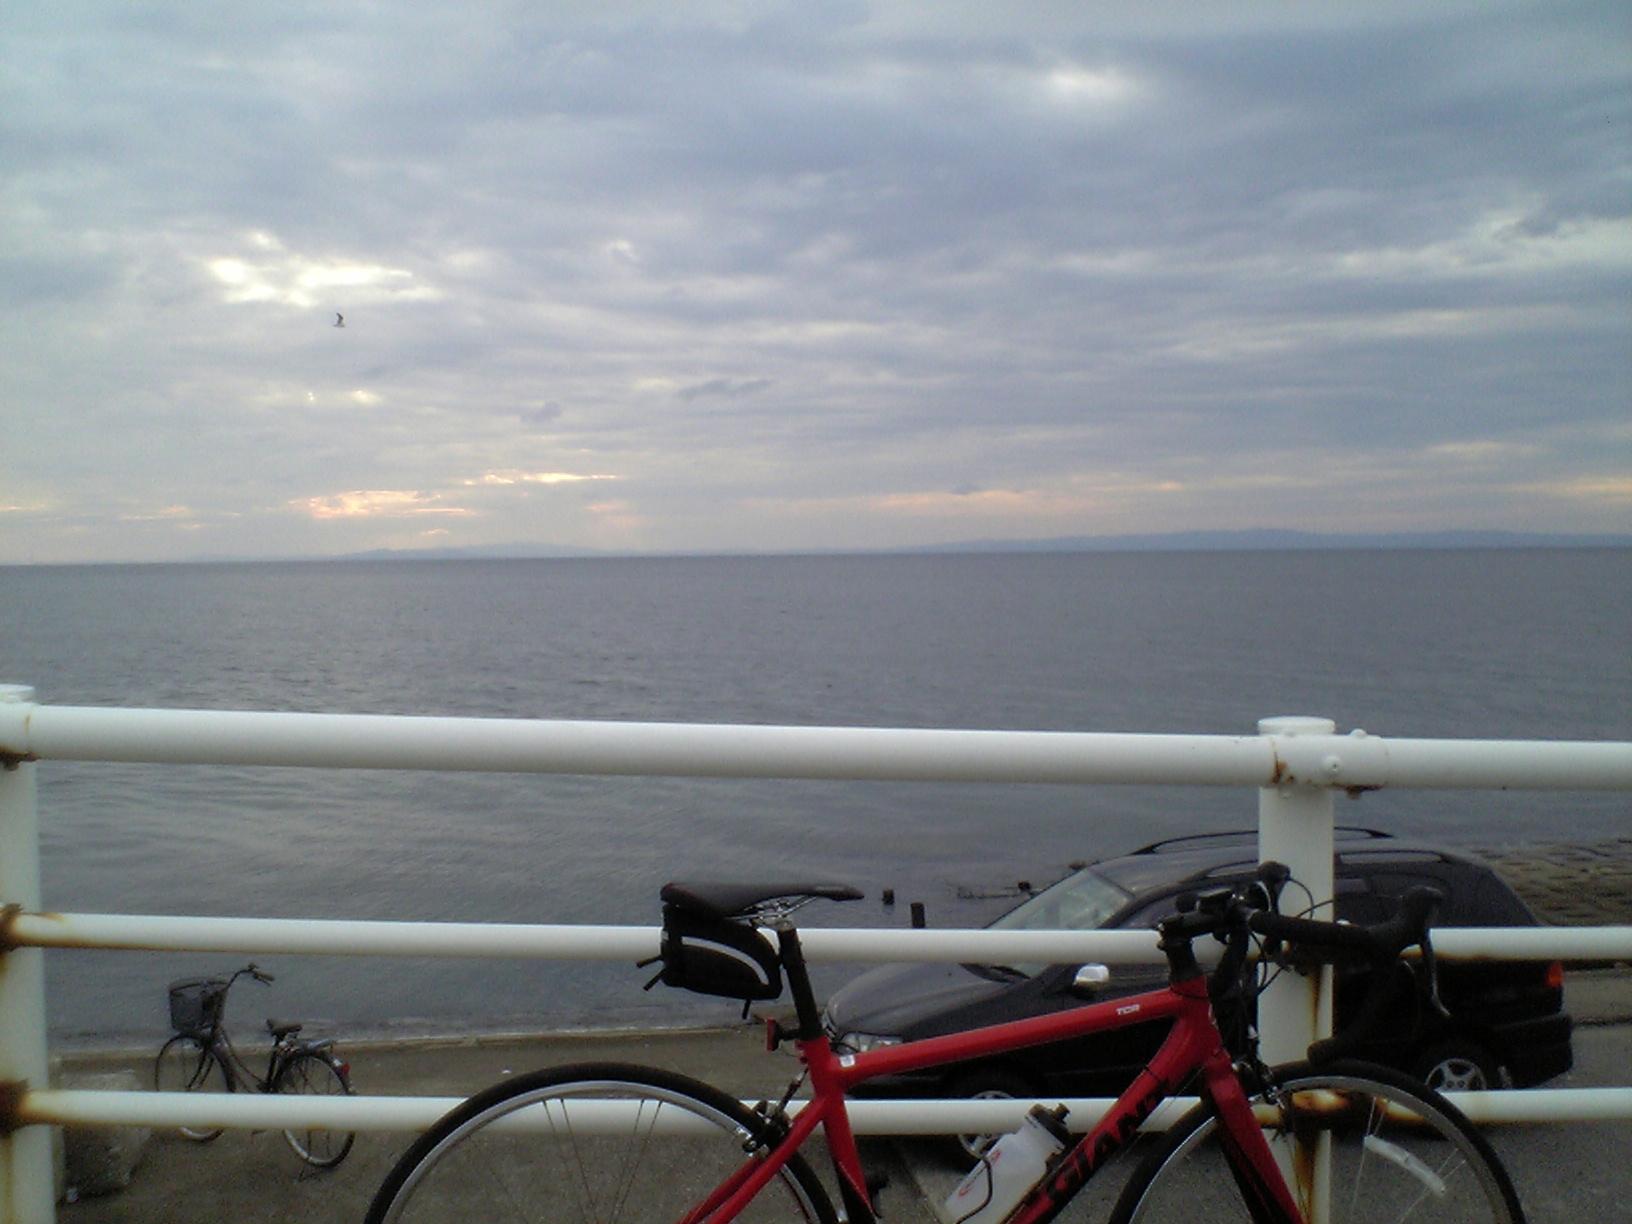 071013_cycling7